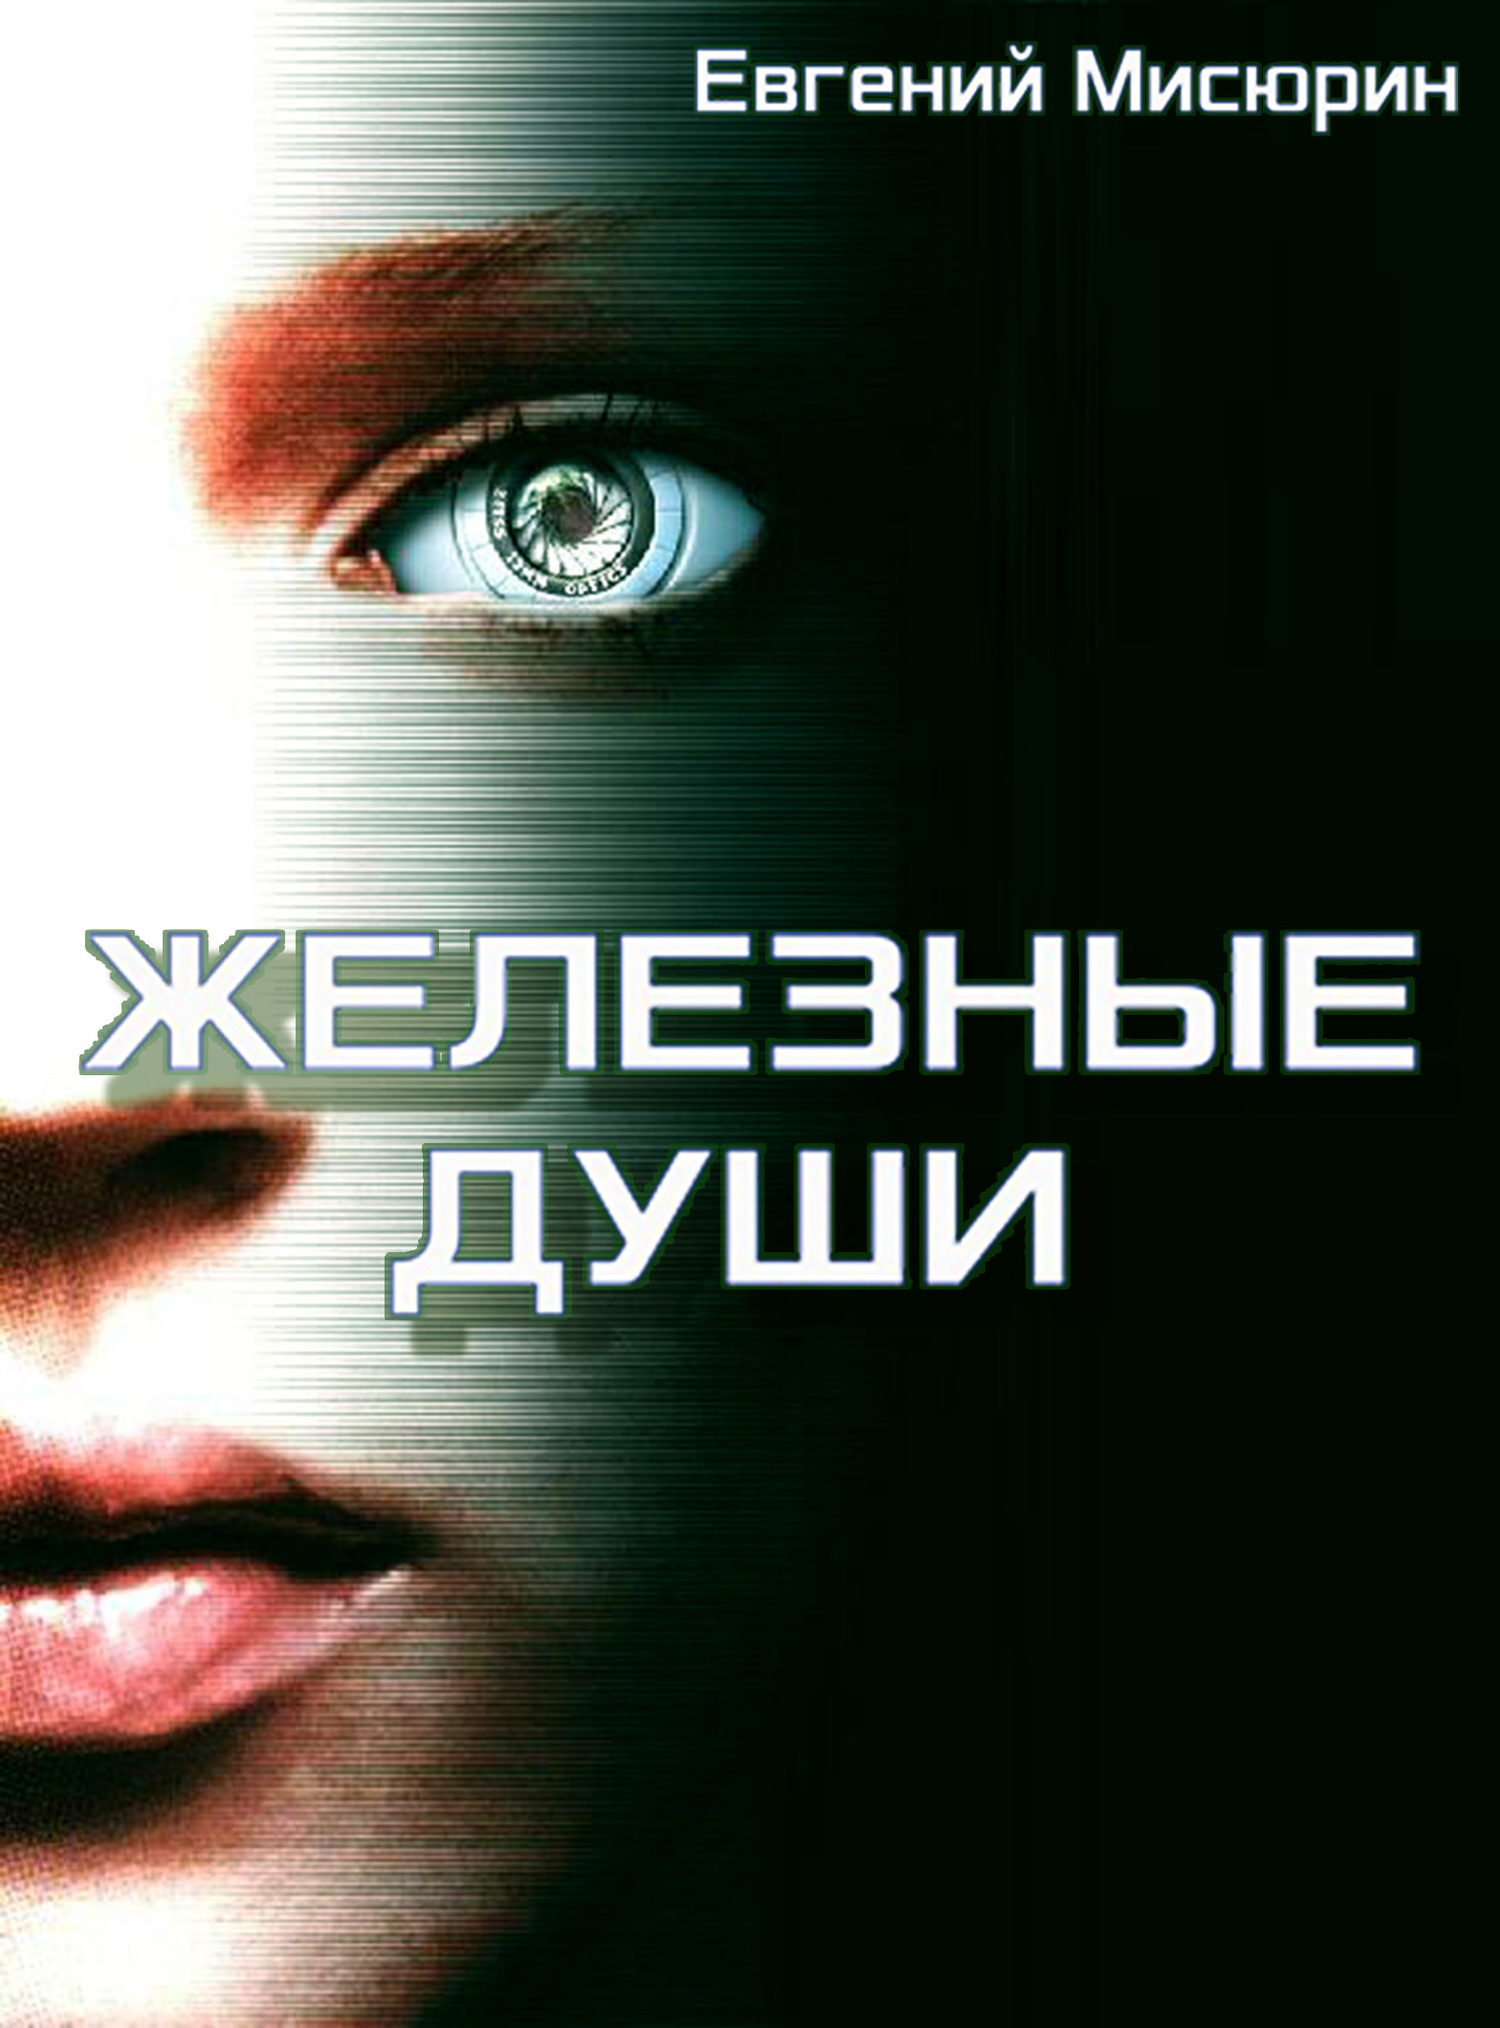 Евгений Мисюрин бесплатно